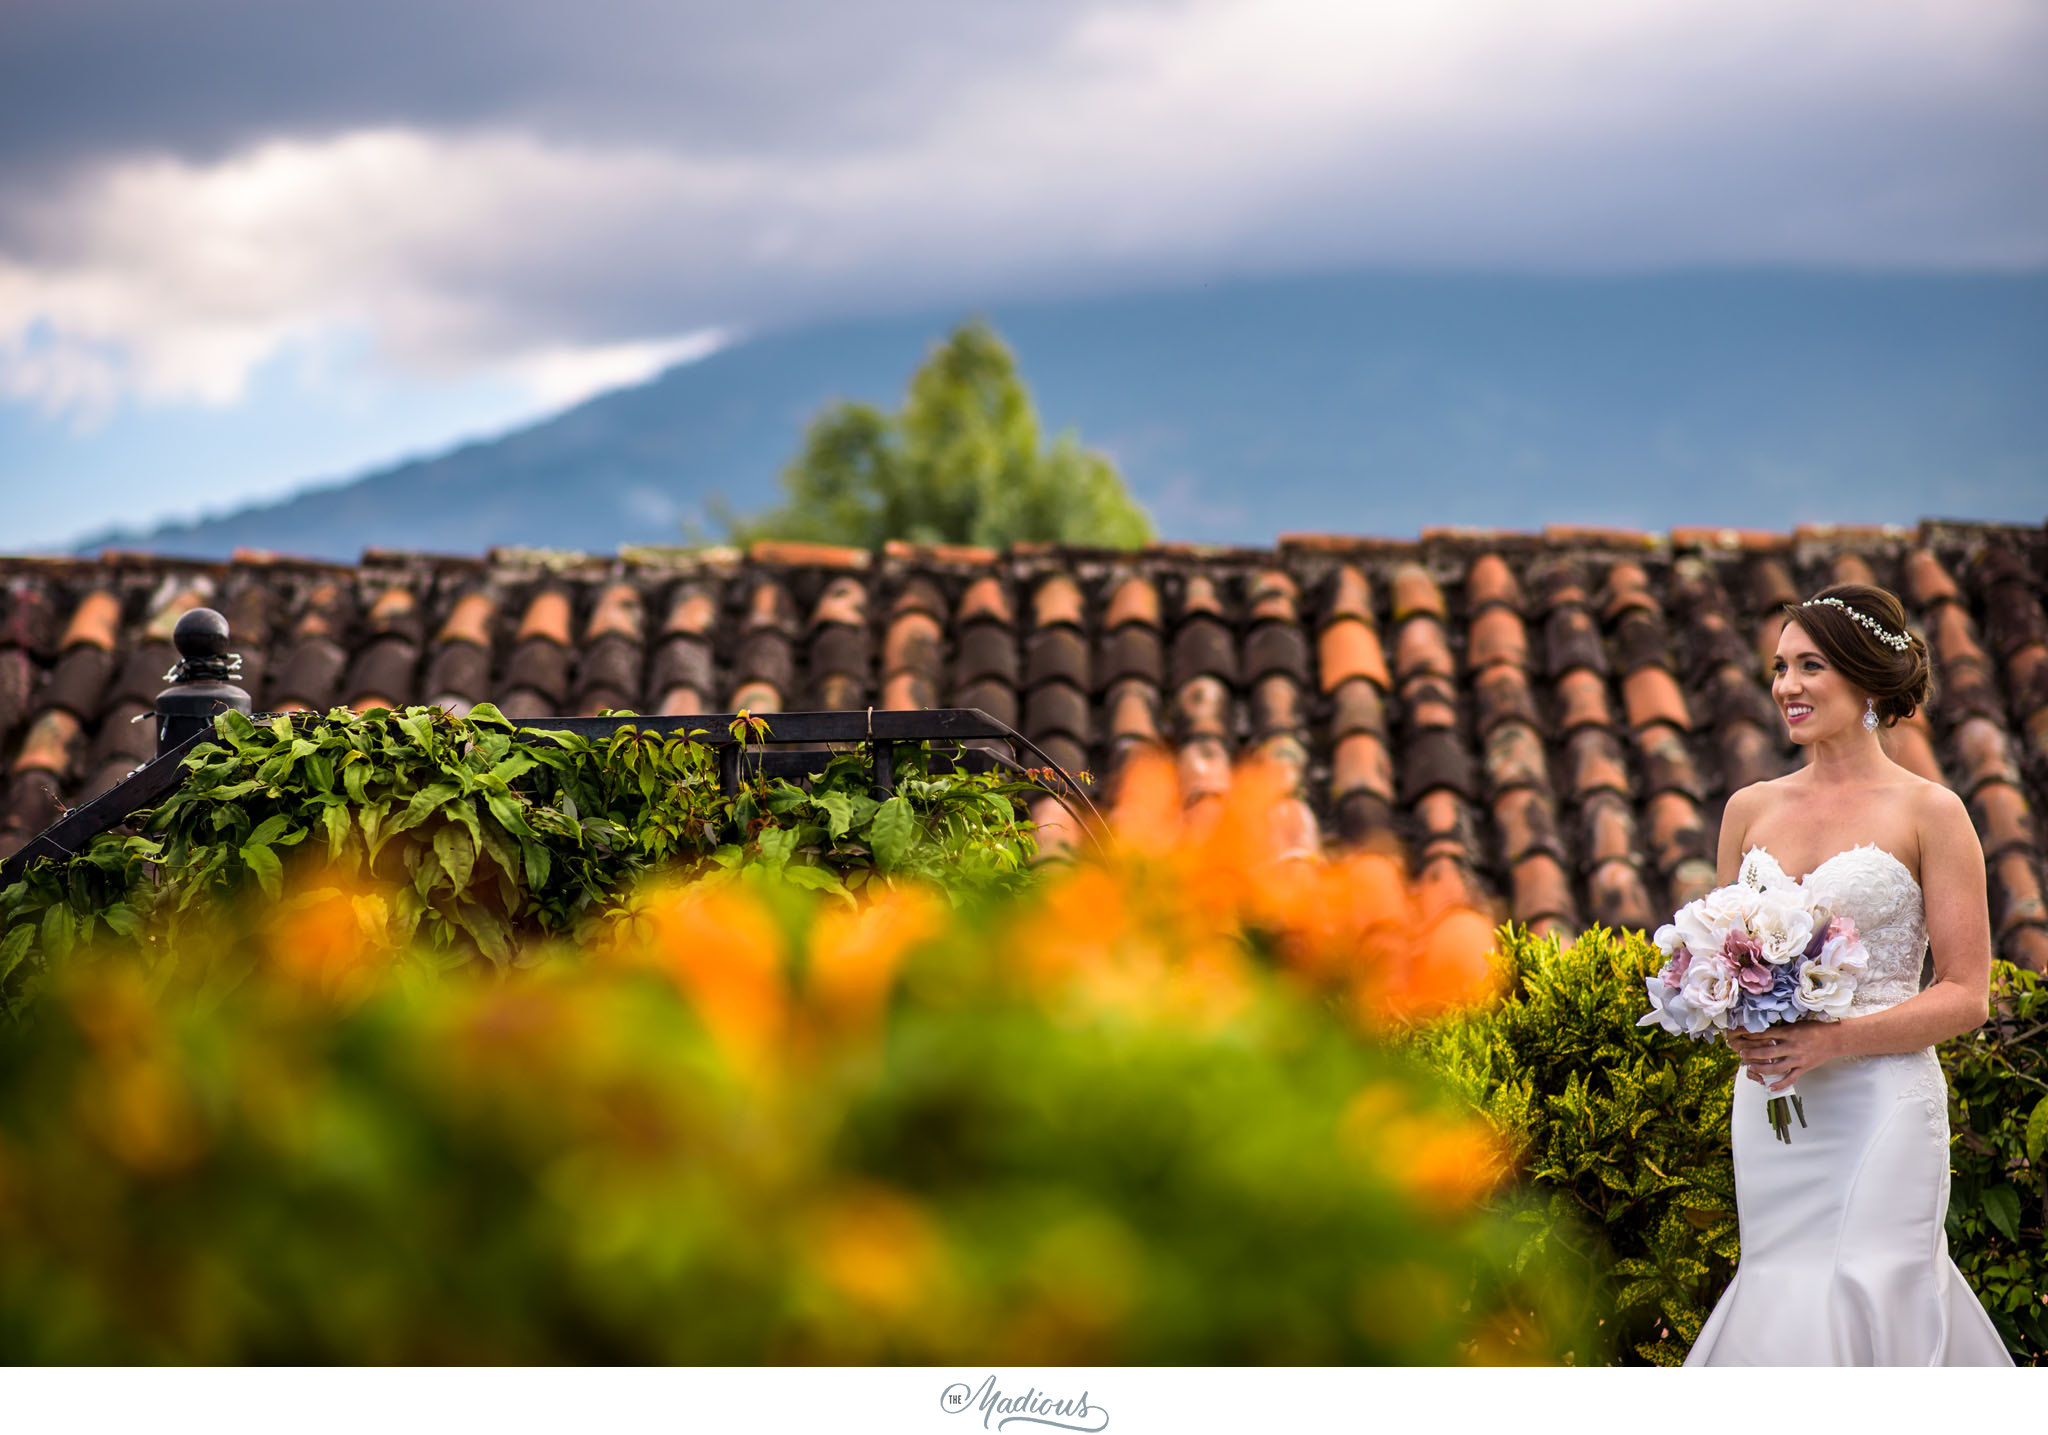 Leigh_Rob_Antigua_Guatemala_Santa_Clara_Destination_Wedding_28.JPG